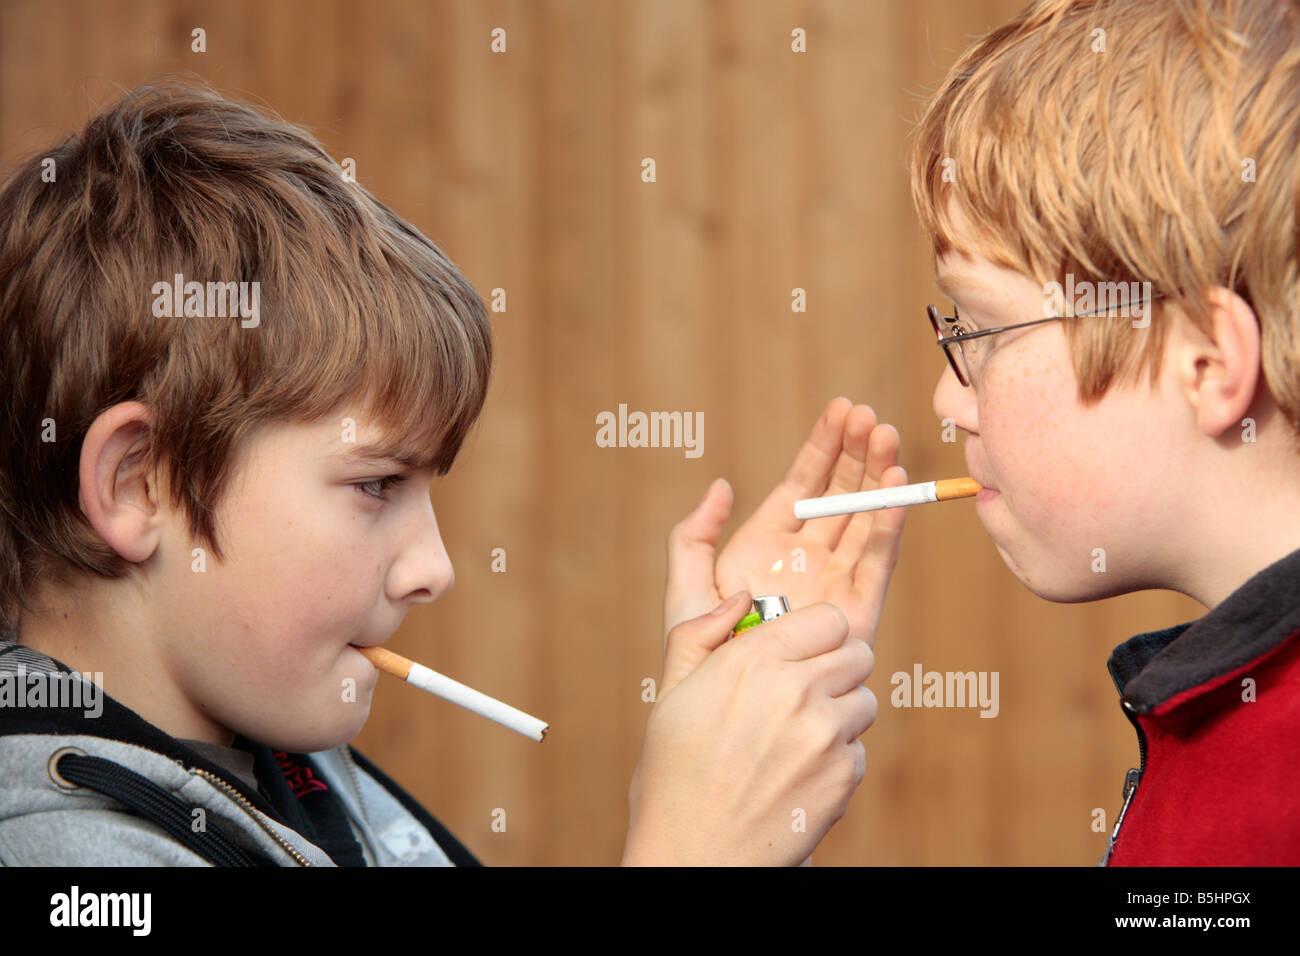 Portrait of two underage boys smoking